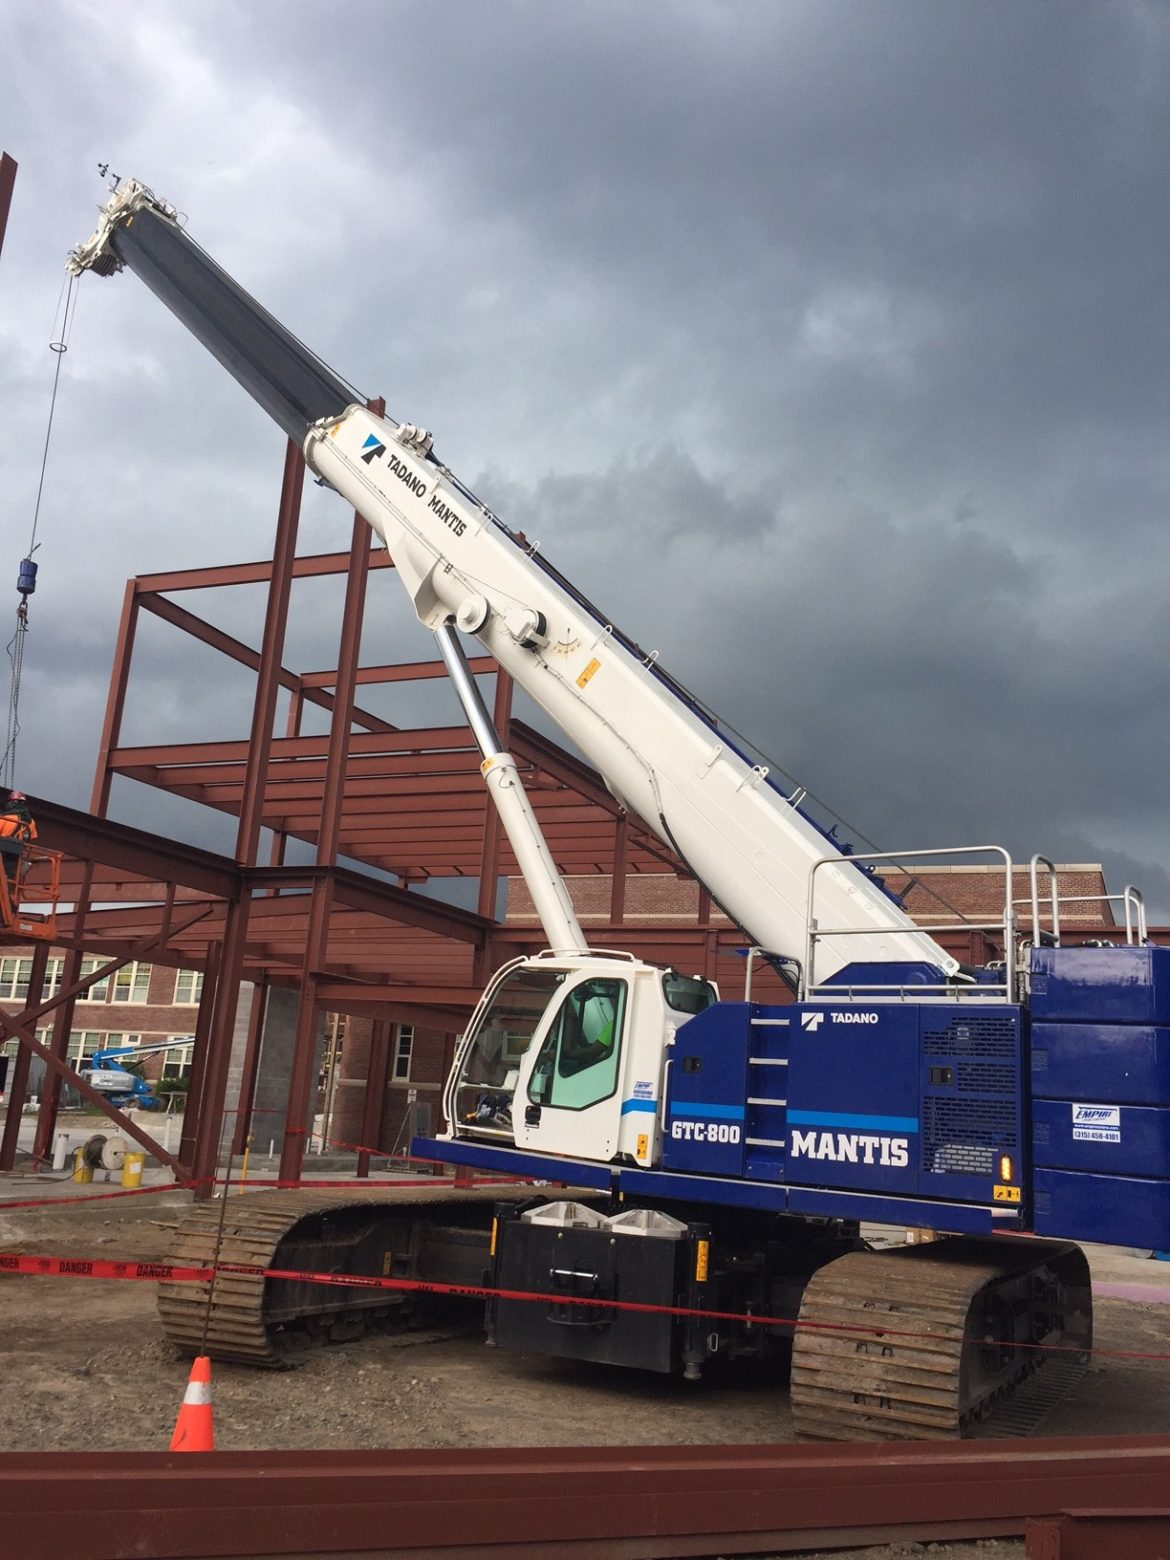 Telescopic Crane Tadano : Featured crane tadano mantis gtc telescopic boom